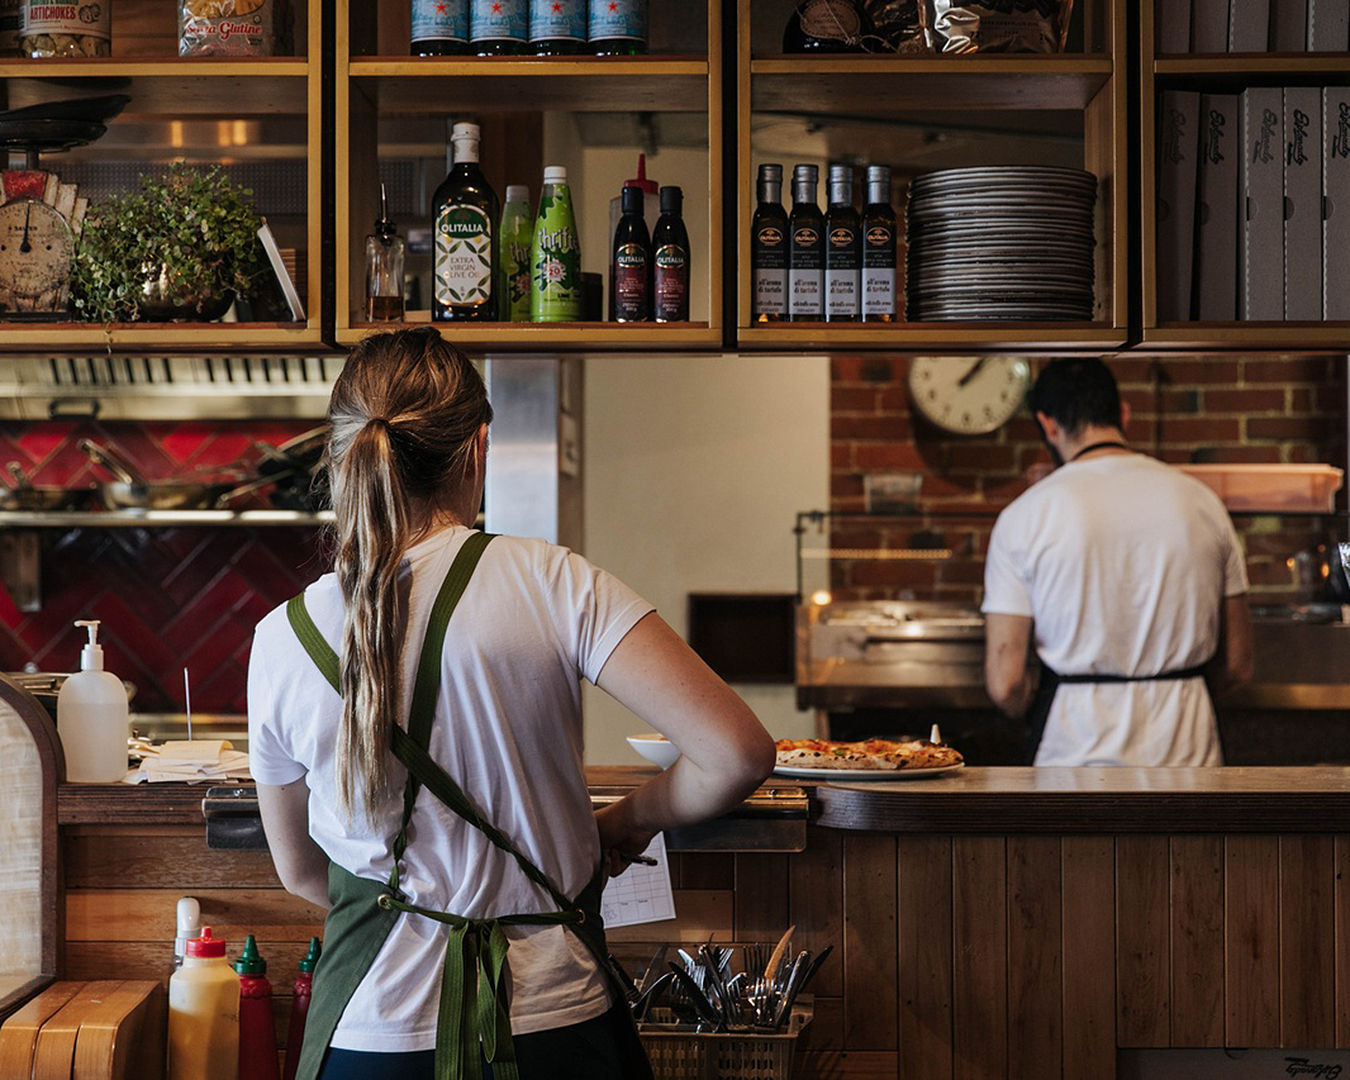 Server and chef hard at work at The Esplanade.